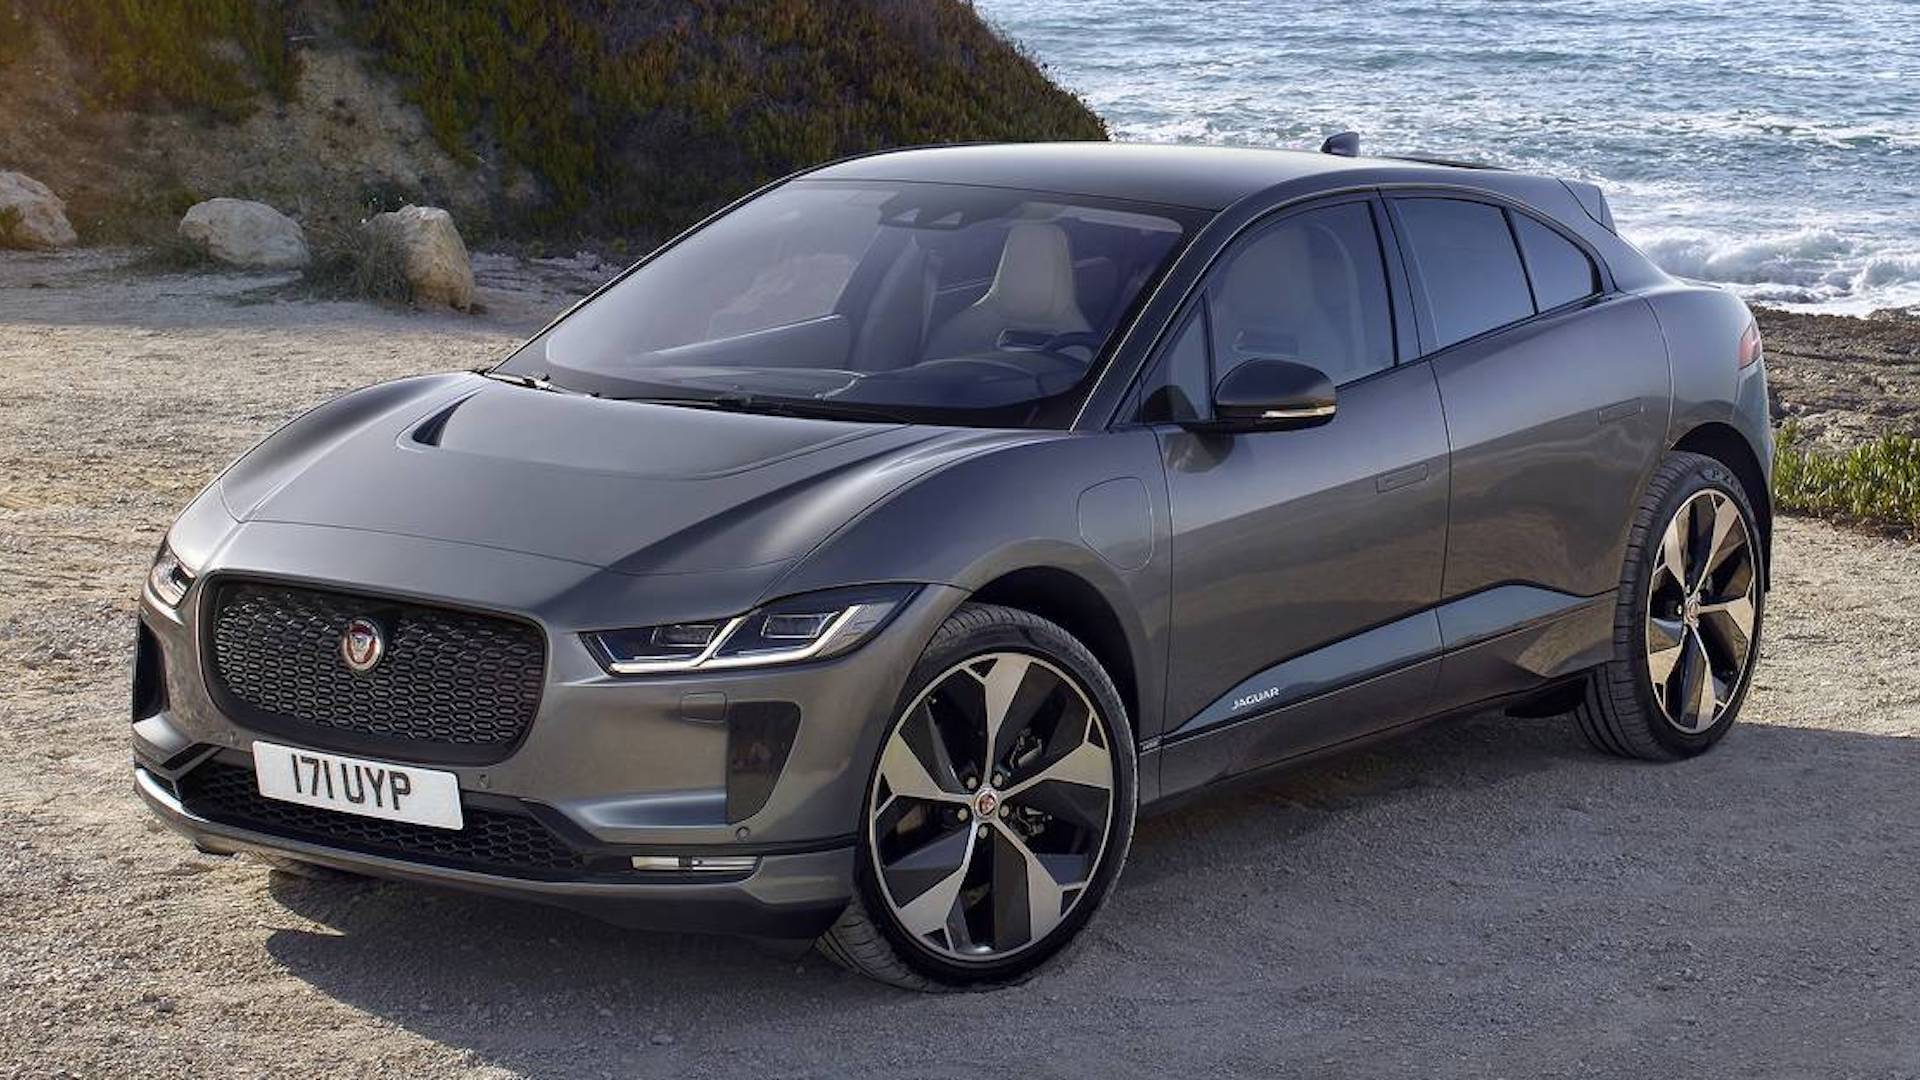 Jaguar será una marca de coches eléctricos a partir de 2025